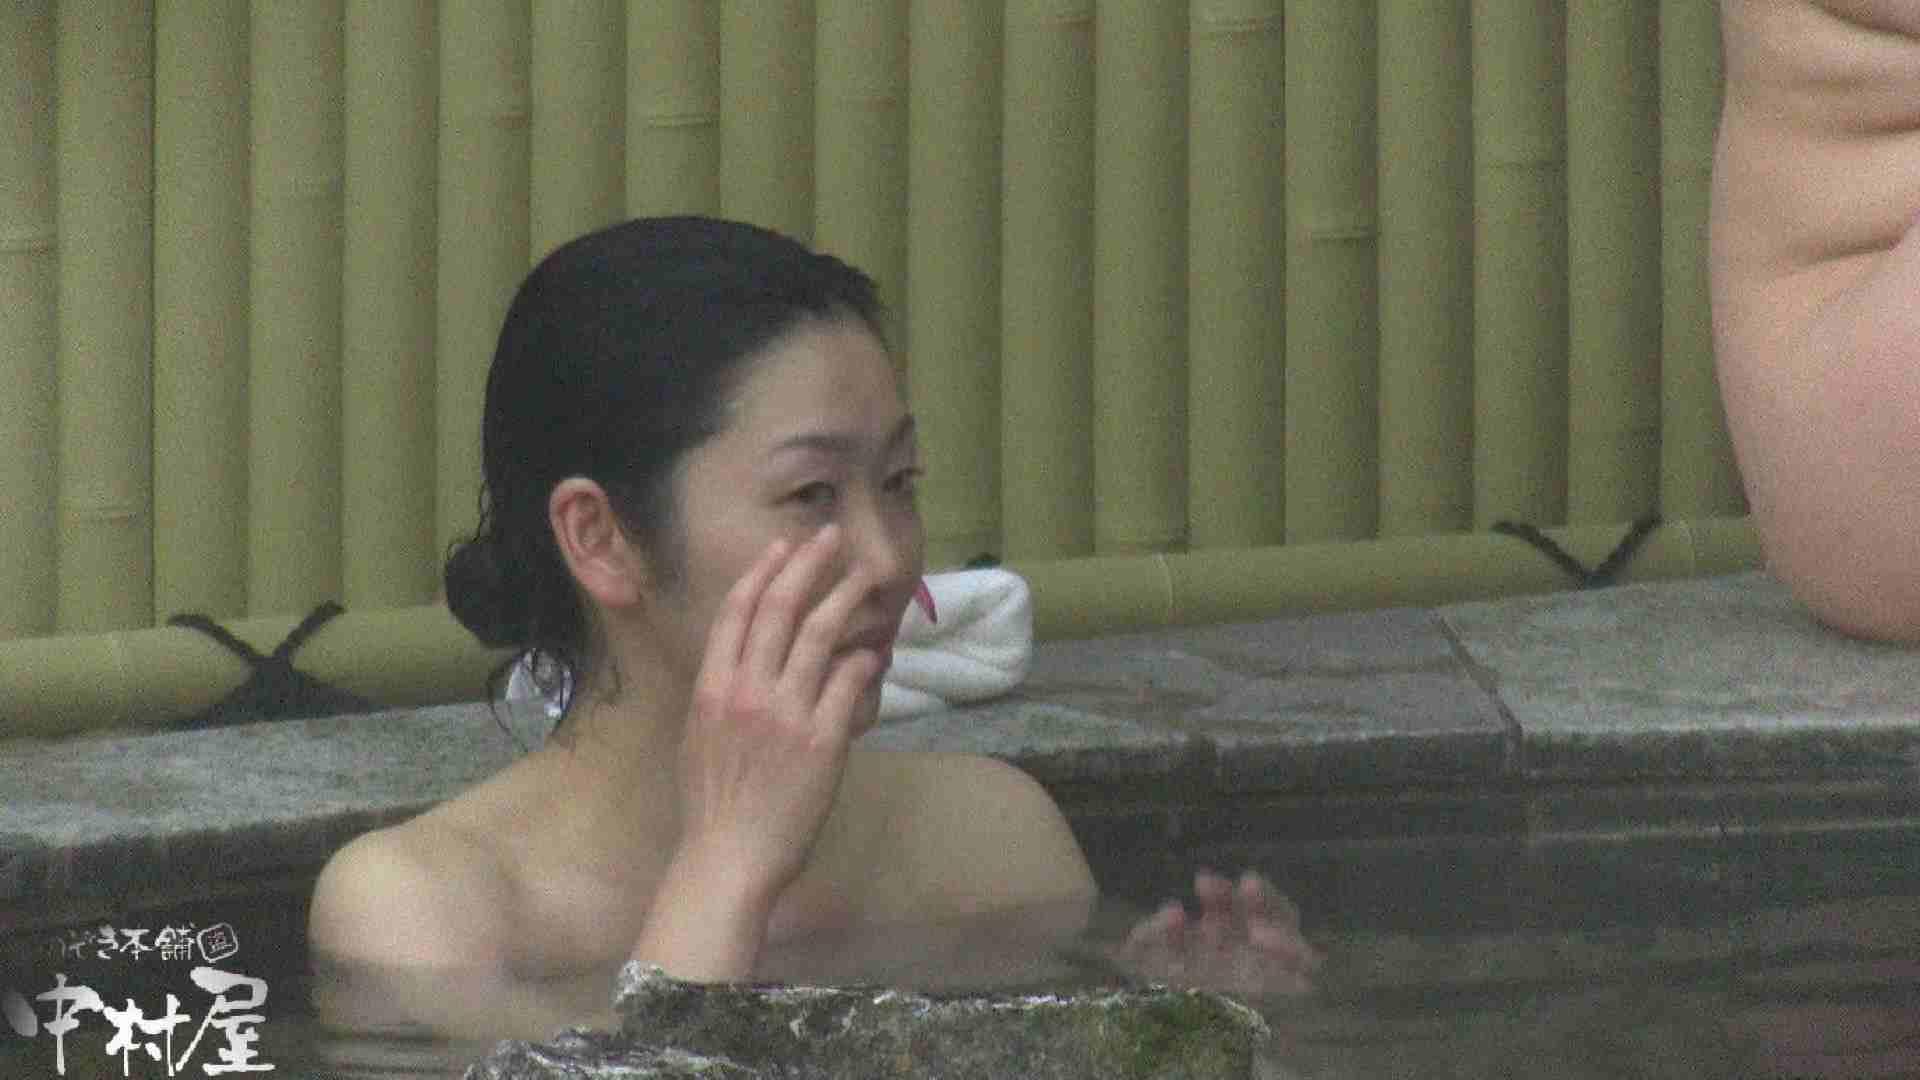 Aquaな露天風呂Vol.917 OLセックス  102画像 51